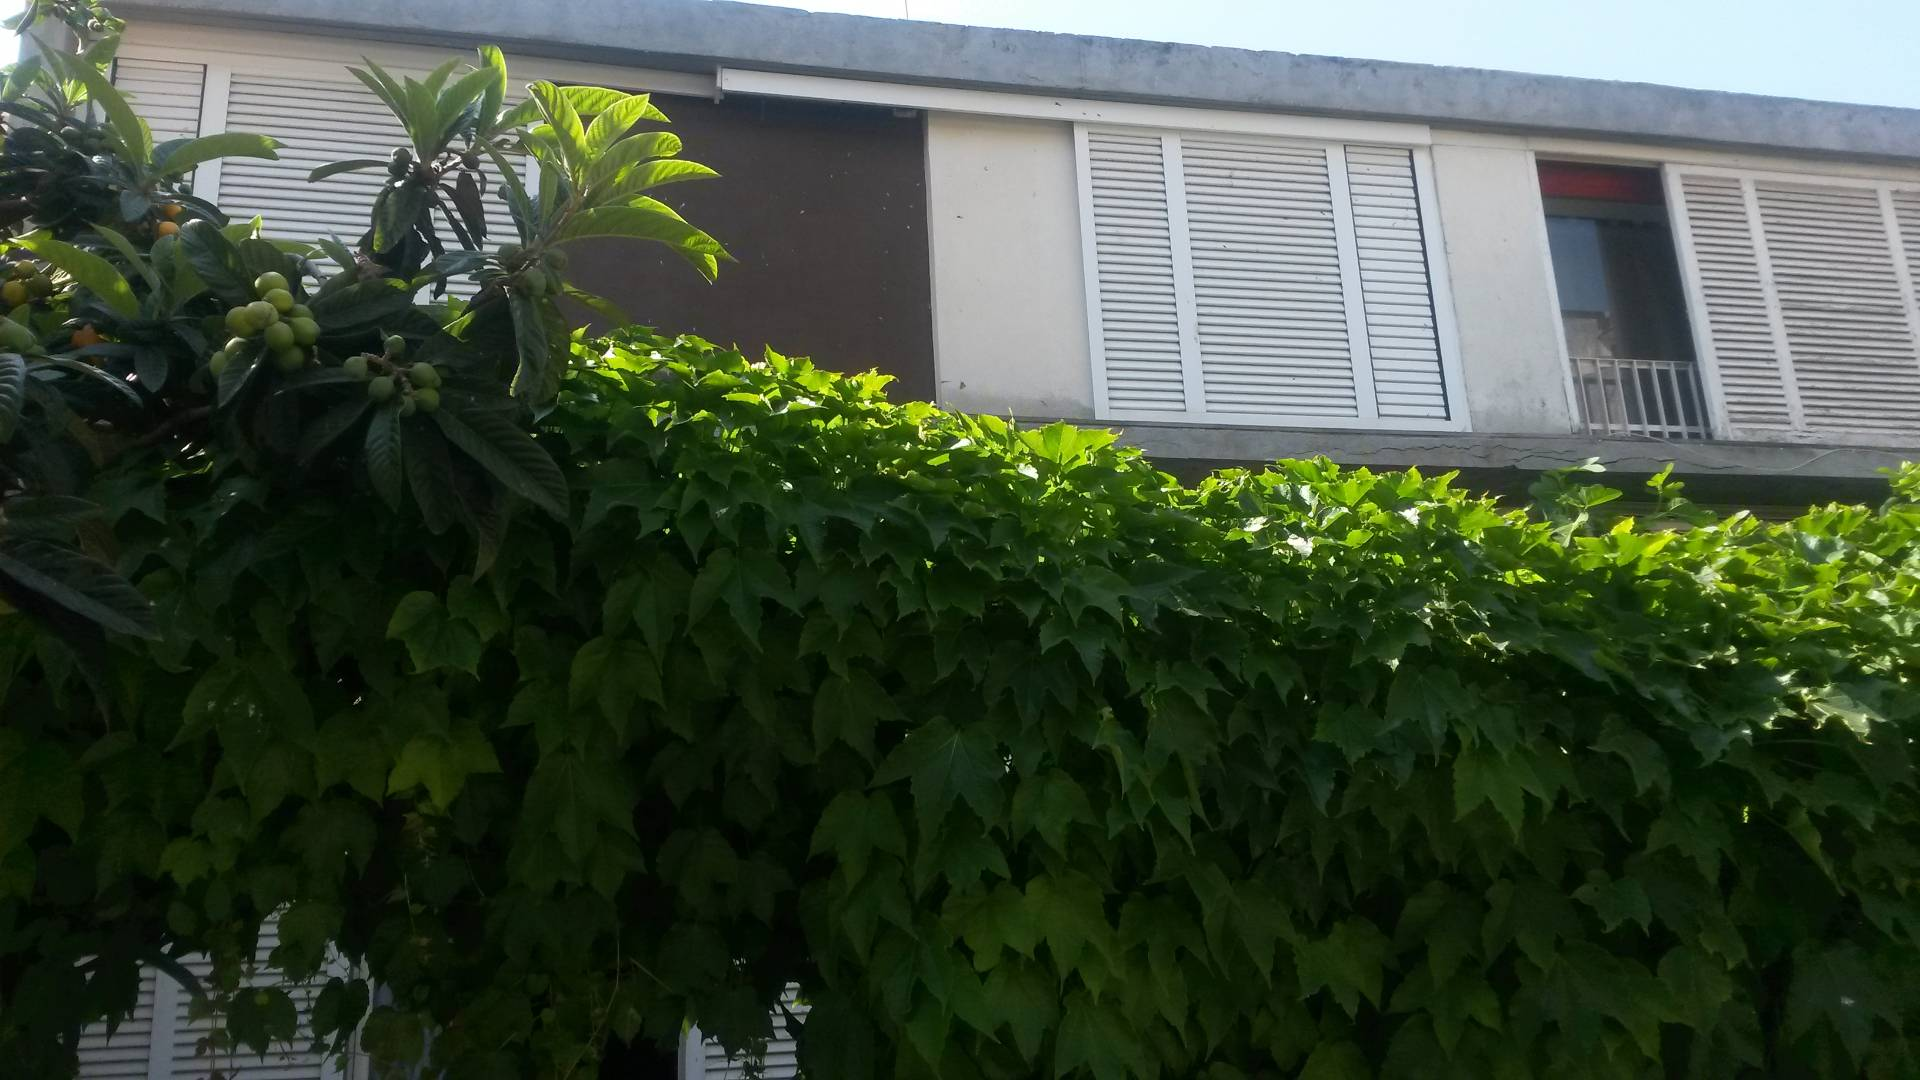 APPARTAMENTO in Affitto a Sessa Aurunca (CASERTA)